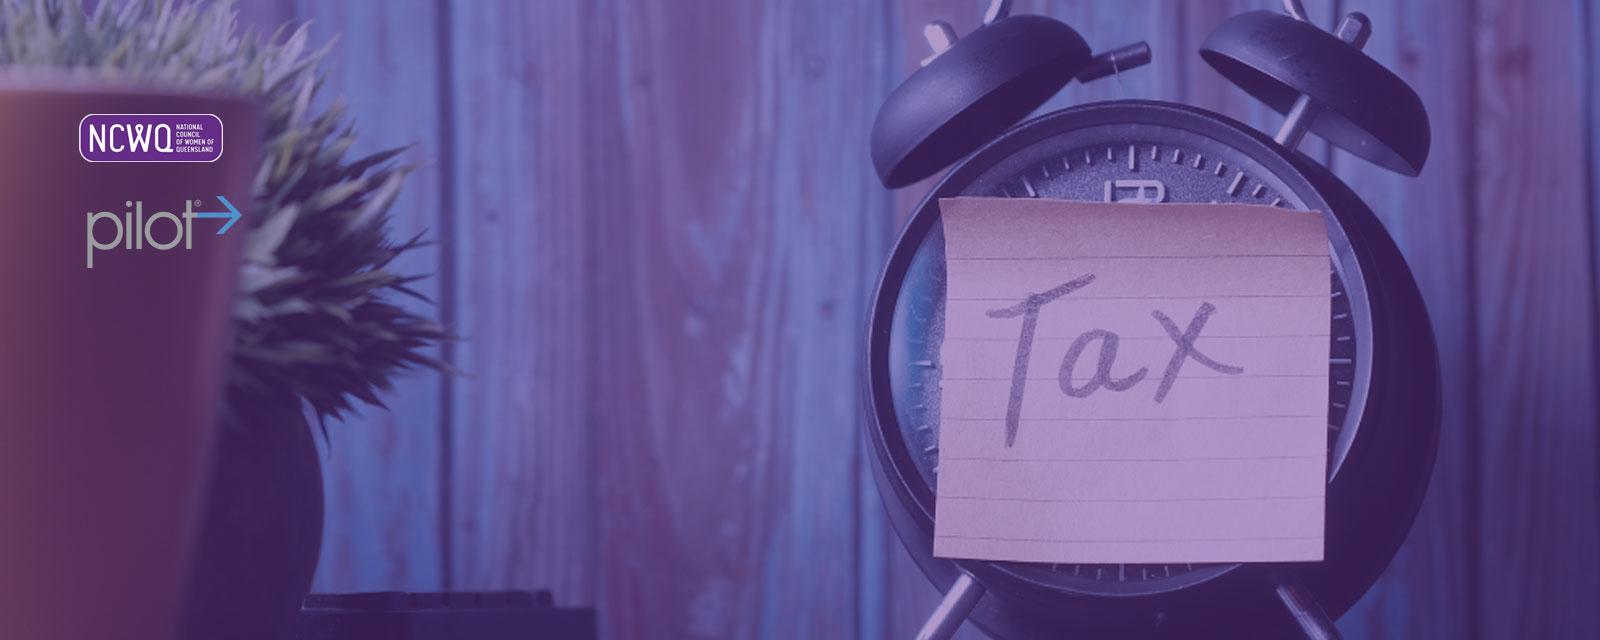 "Empowerment Series - Tax Tips & Tricks ""Empowering Women Through Financial Independence"